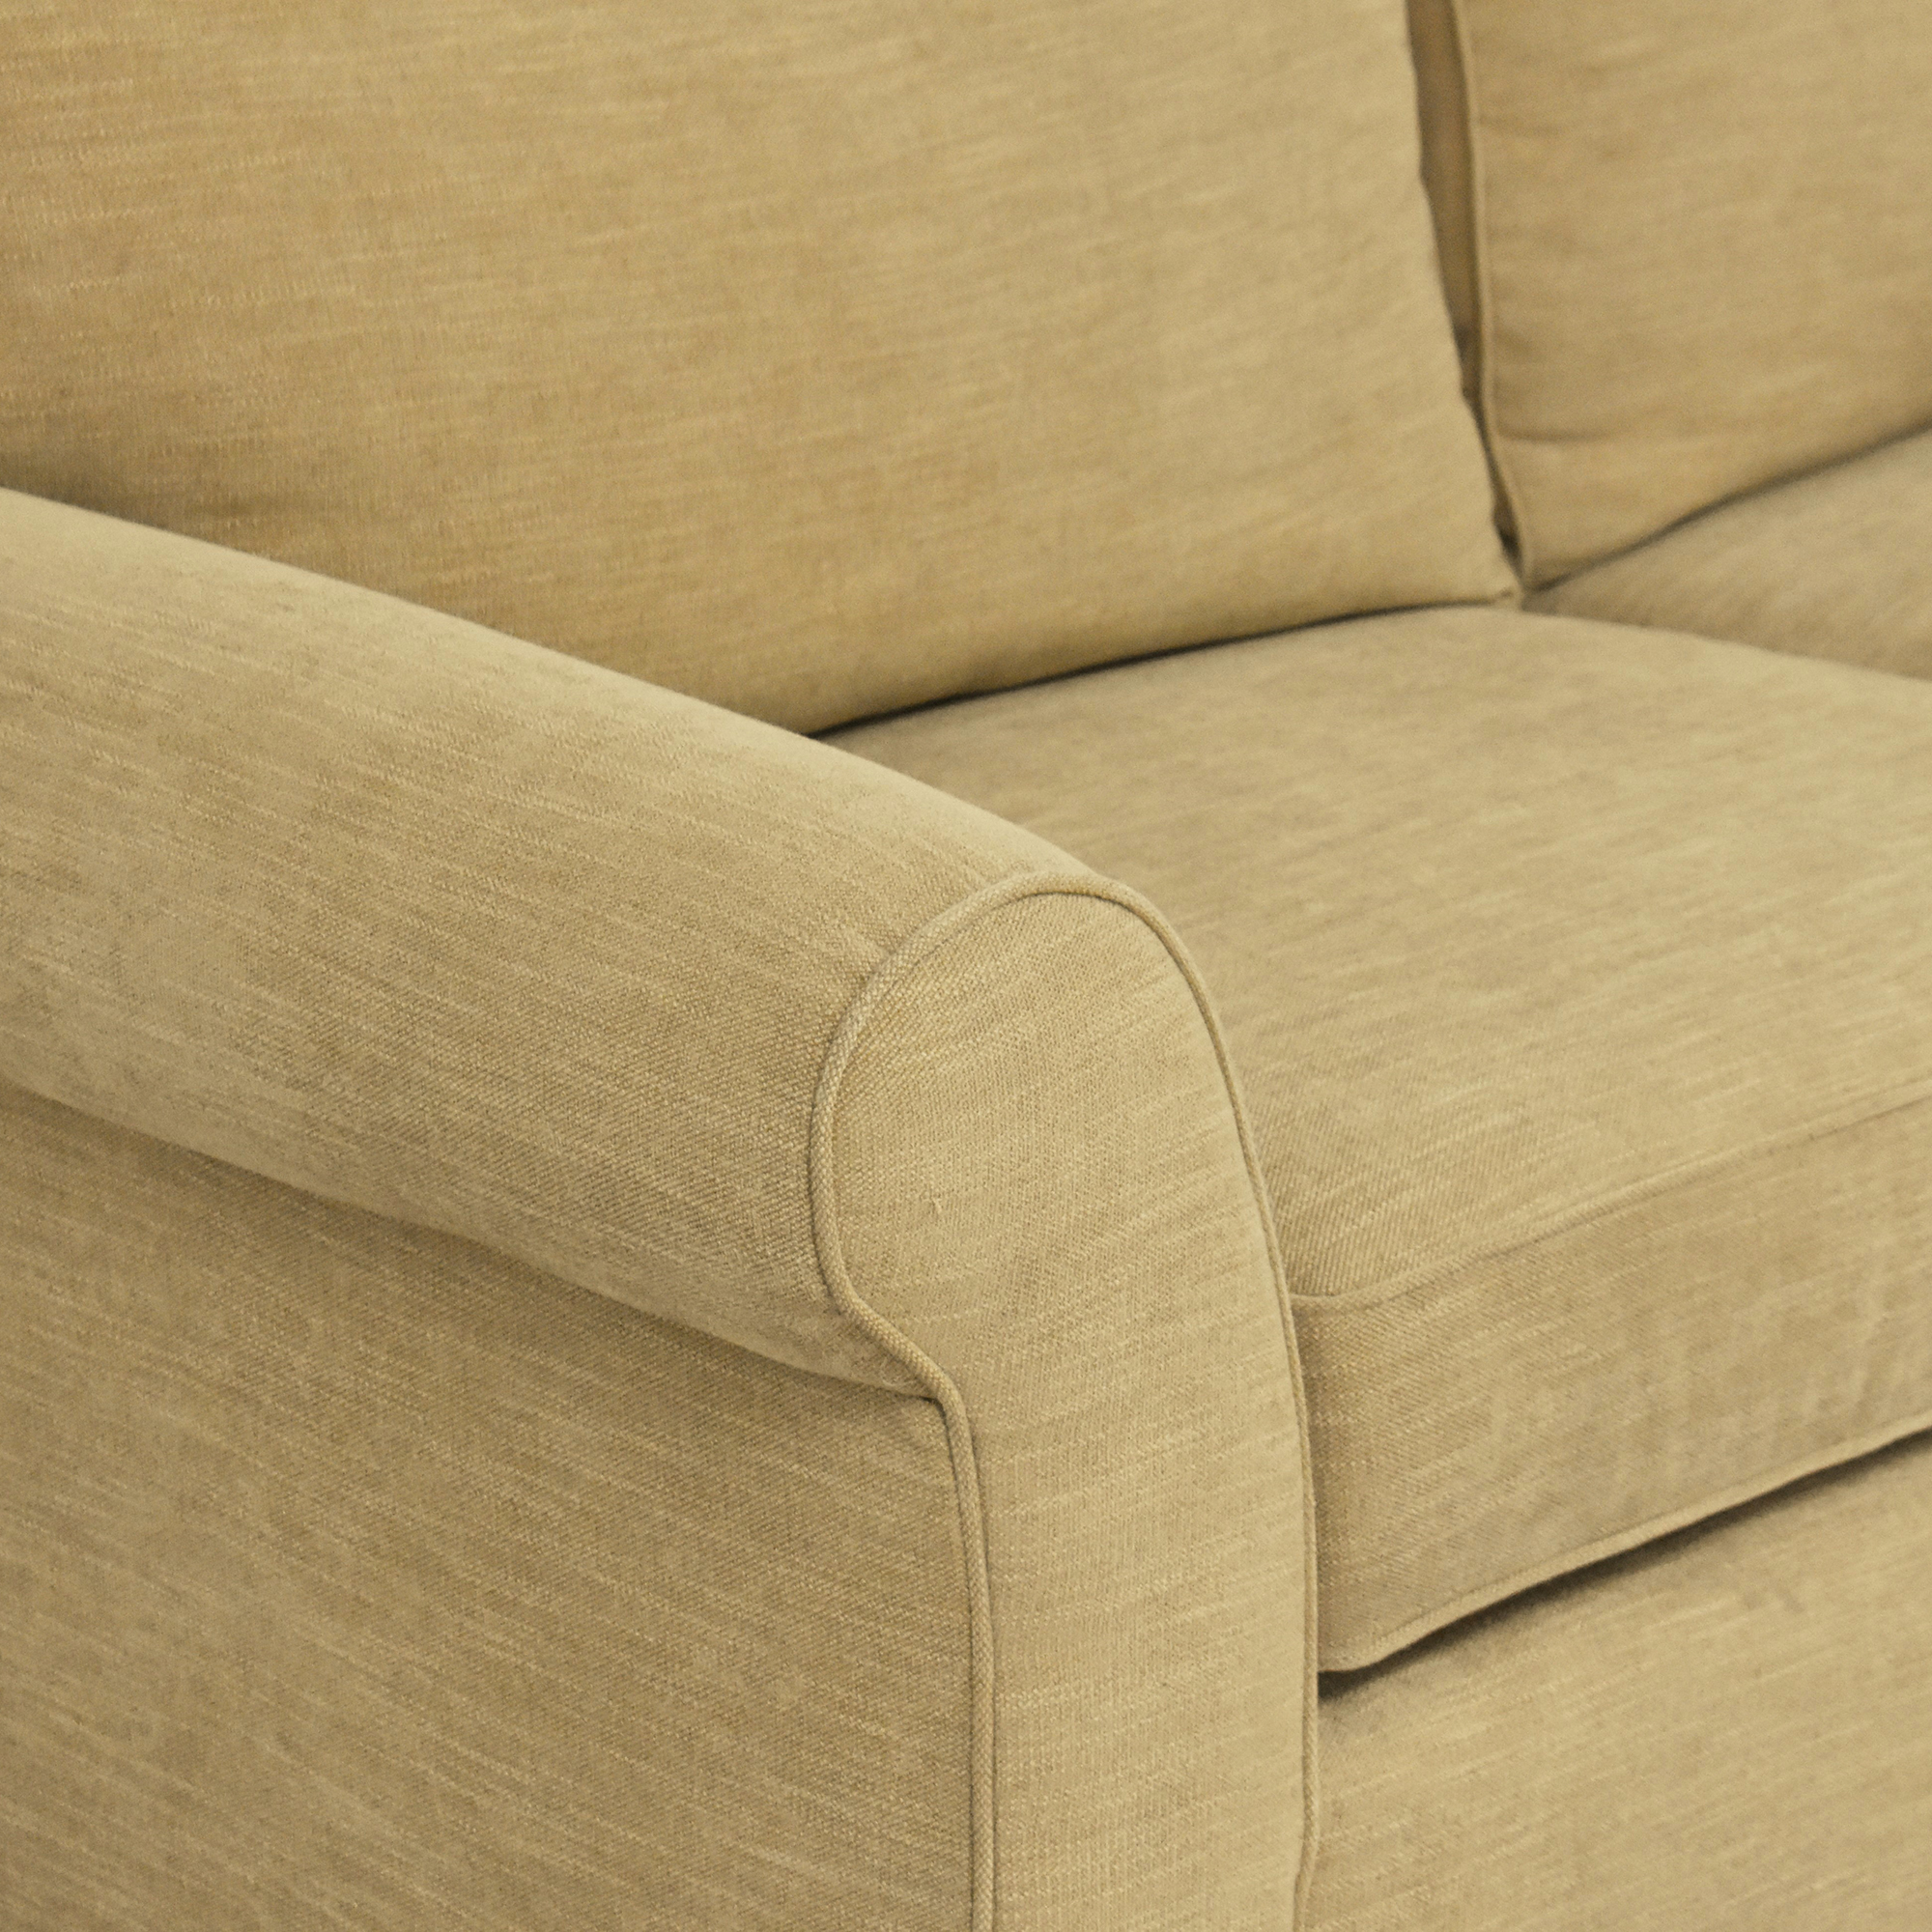 Pottery Barn Pottery Barn Comfort Roll Arm Sofa Sofas